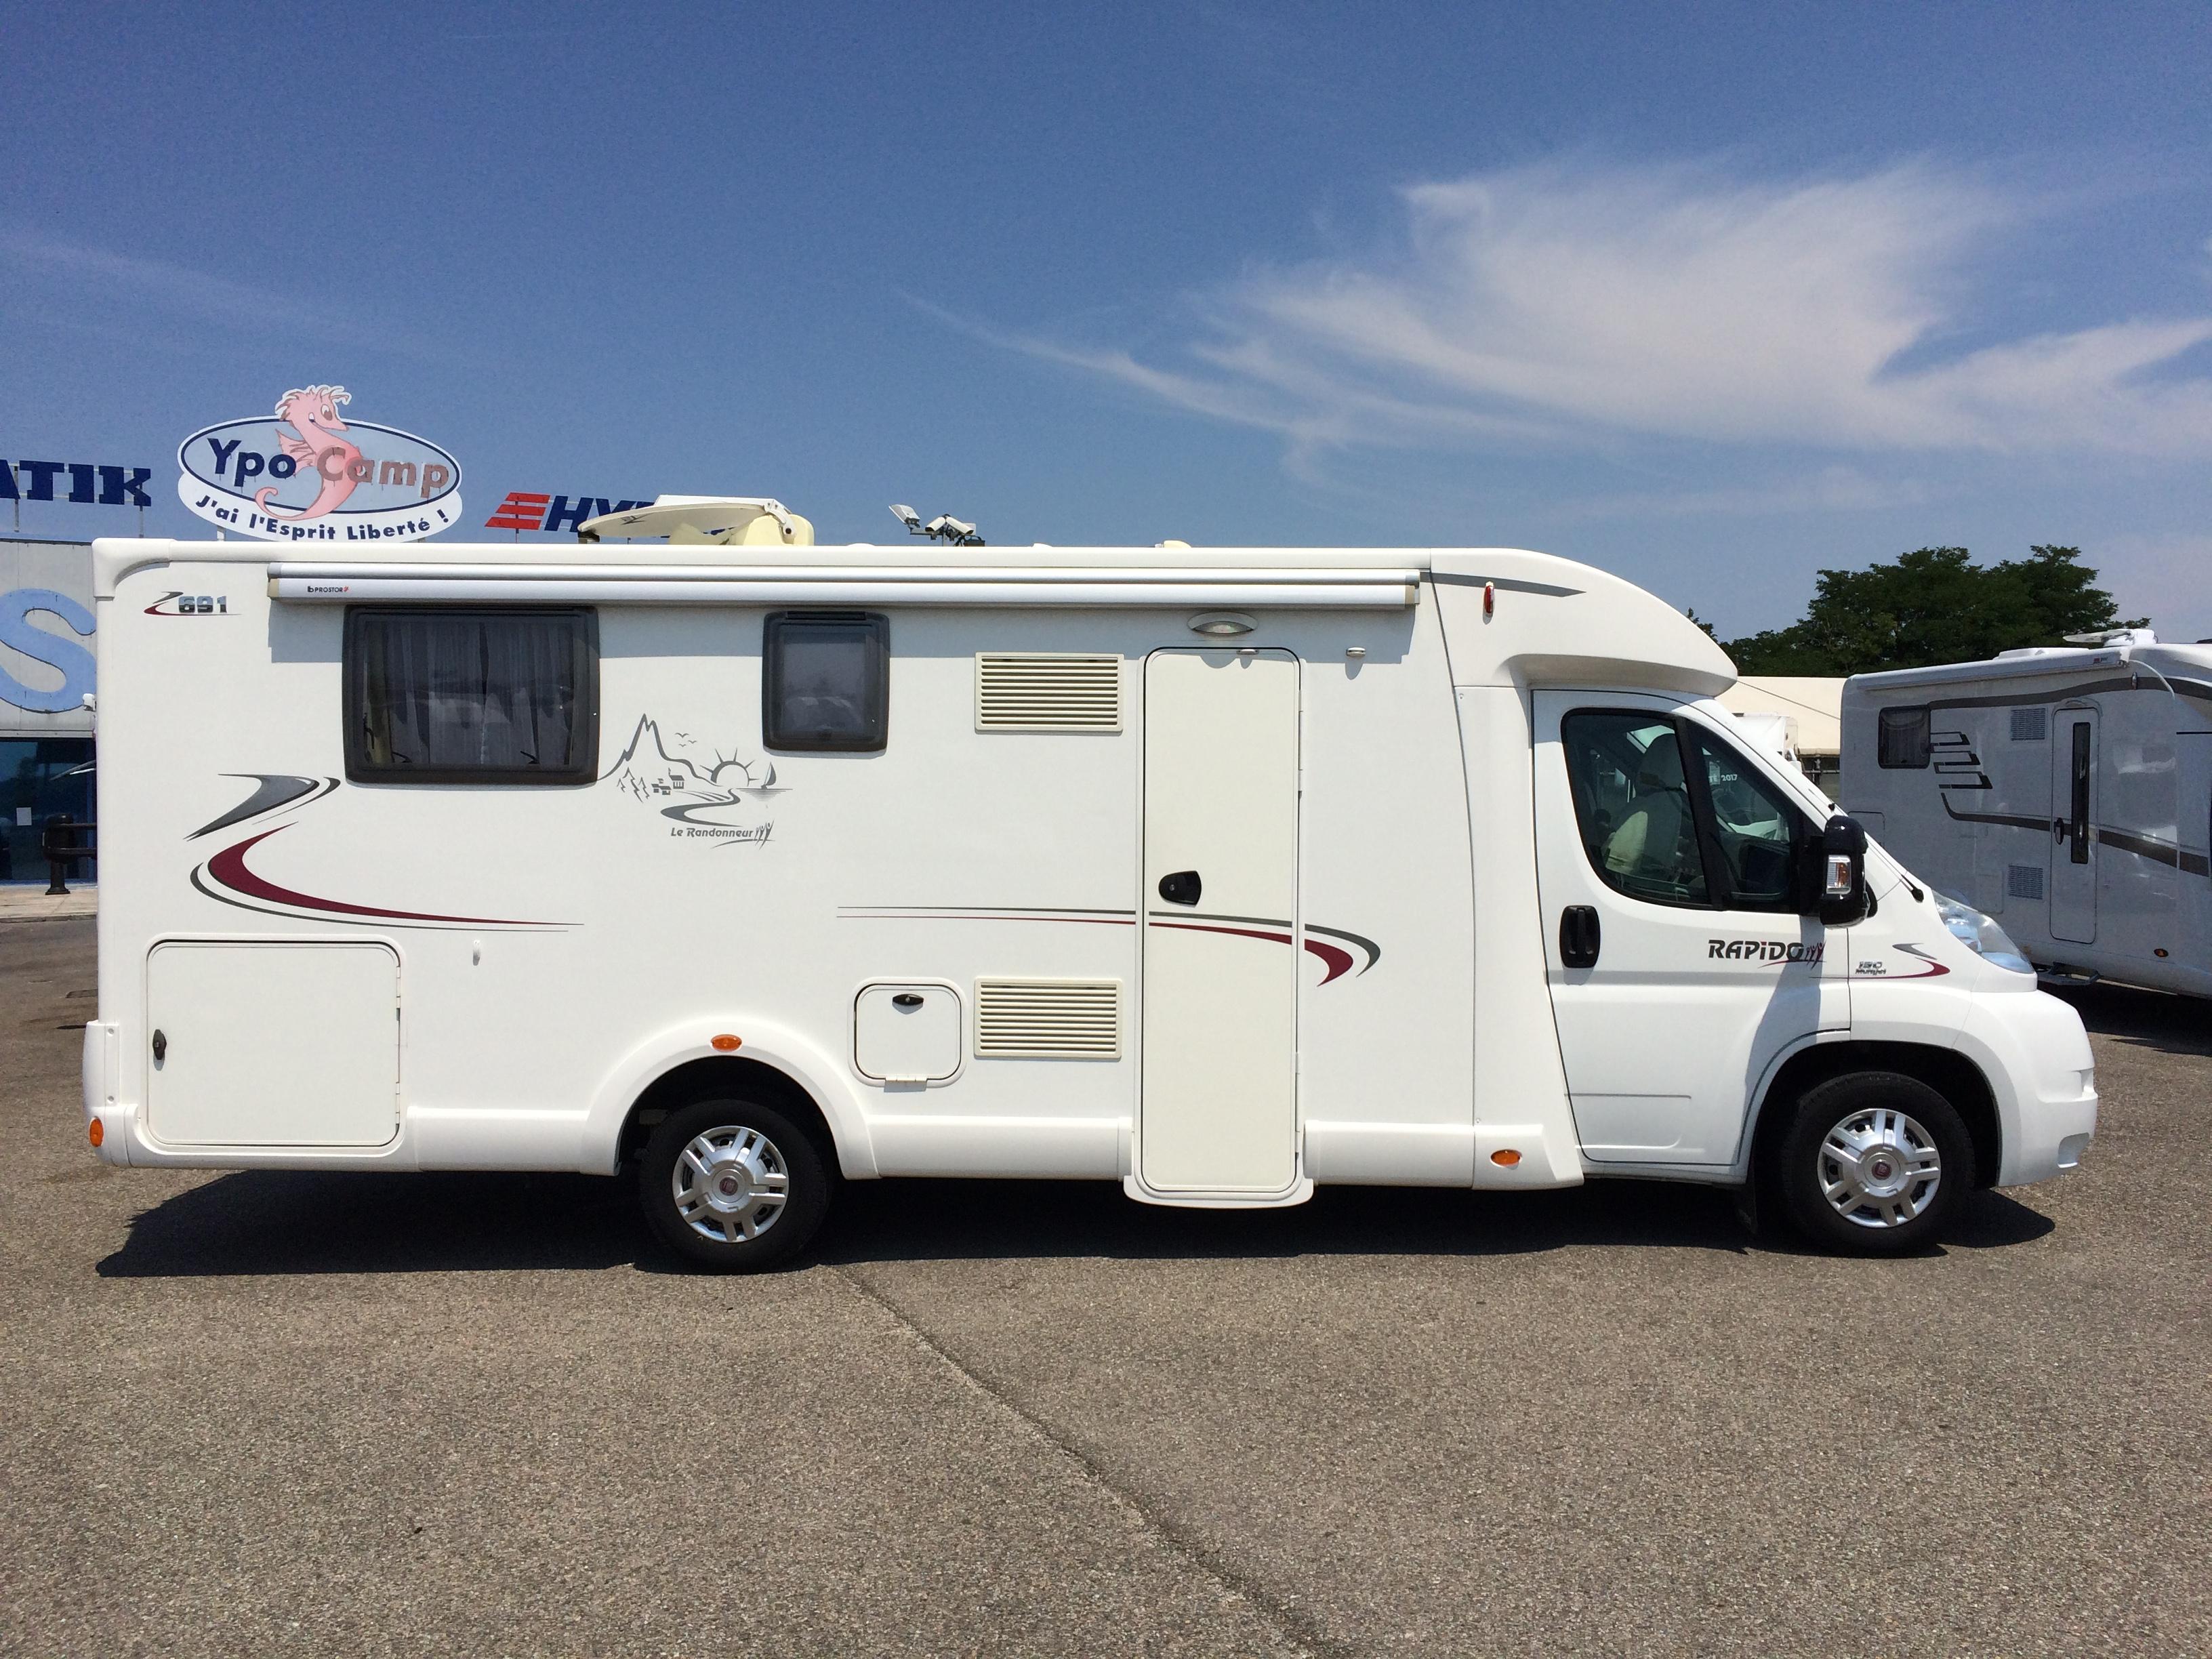 Rapido 691 f occasion de 2011 fiat camping car en - Camping car rapido occasion lit central ...